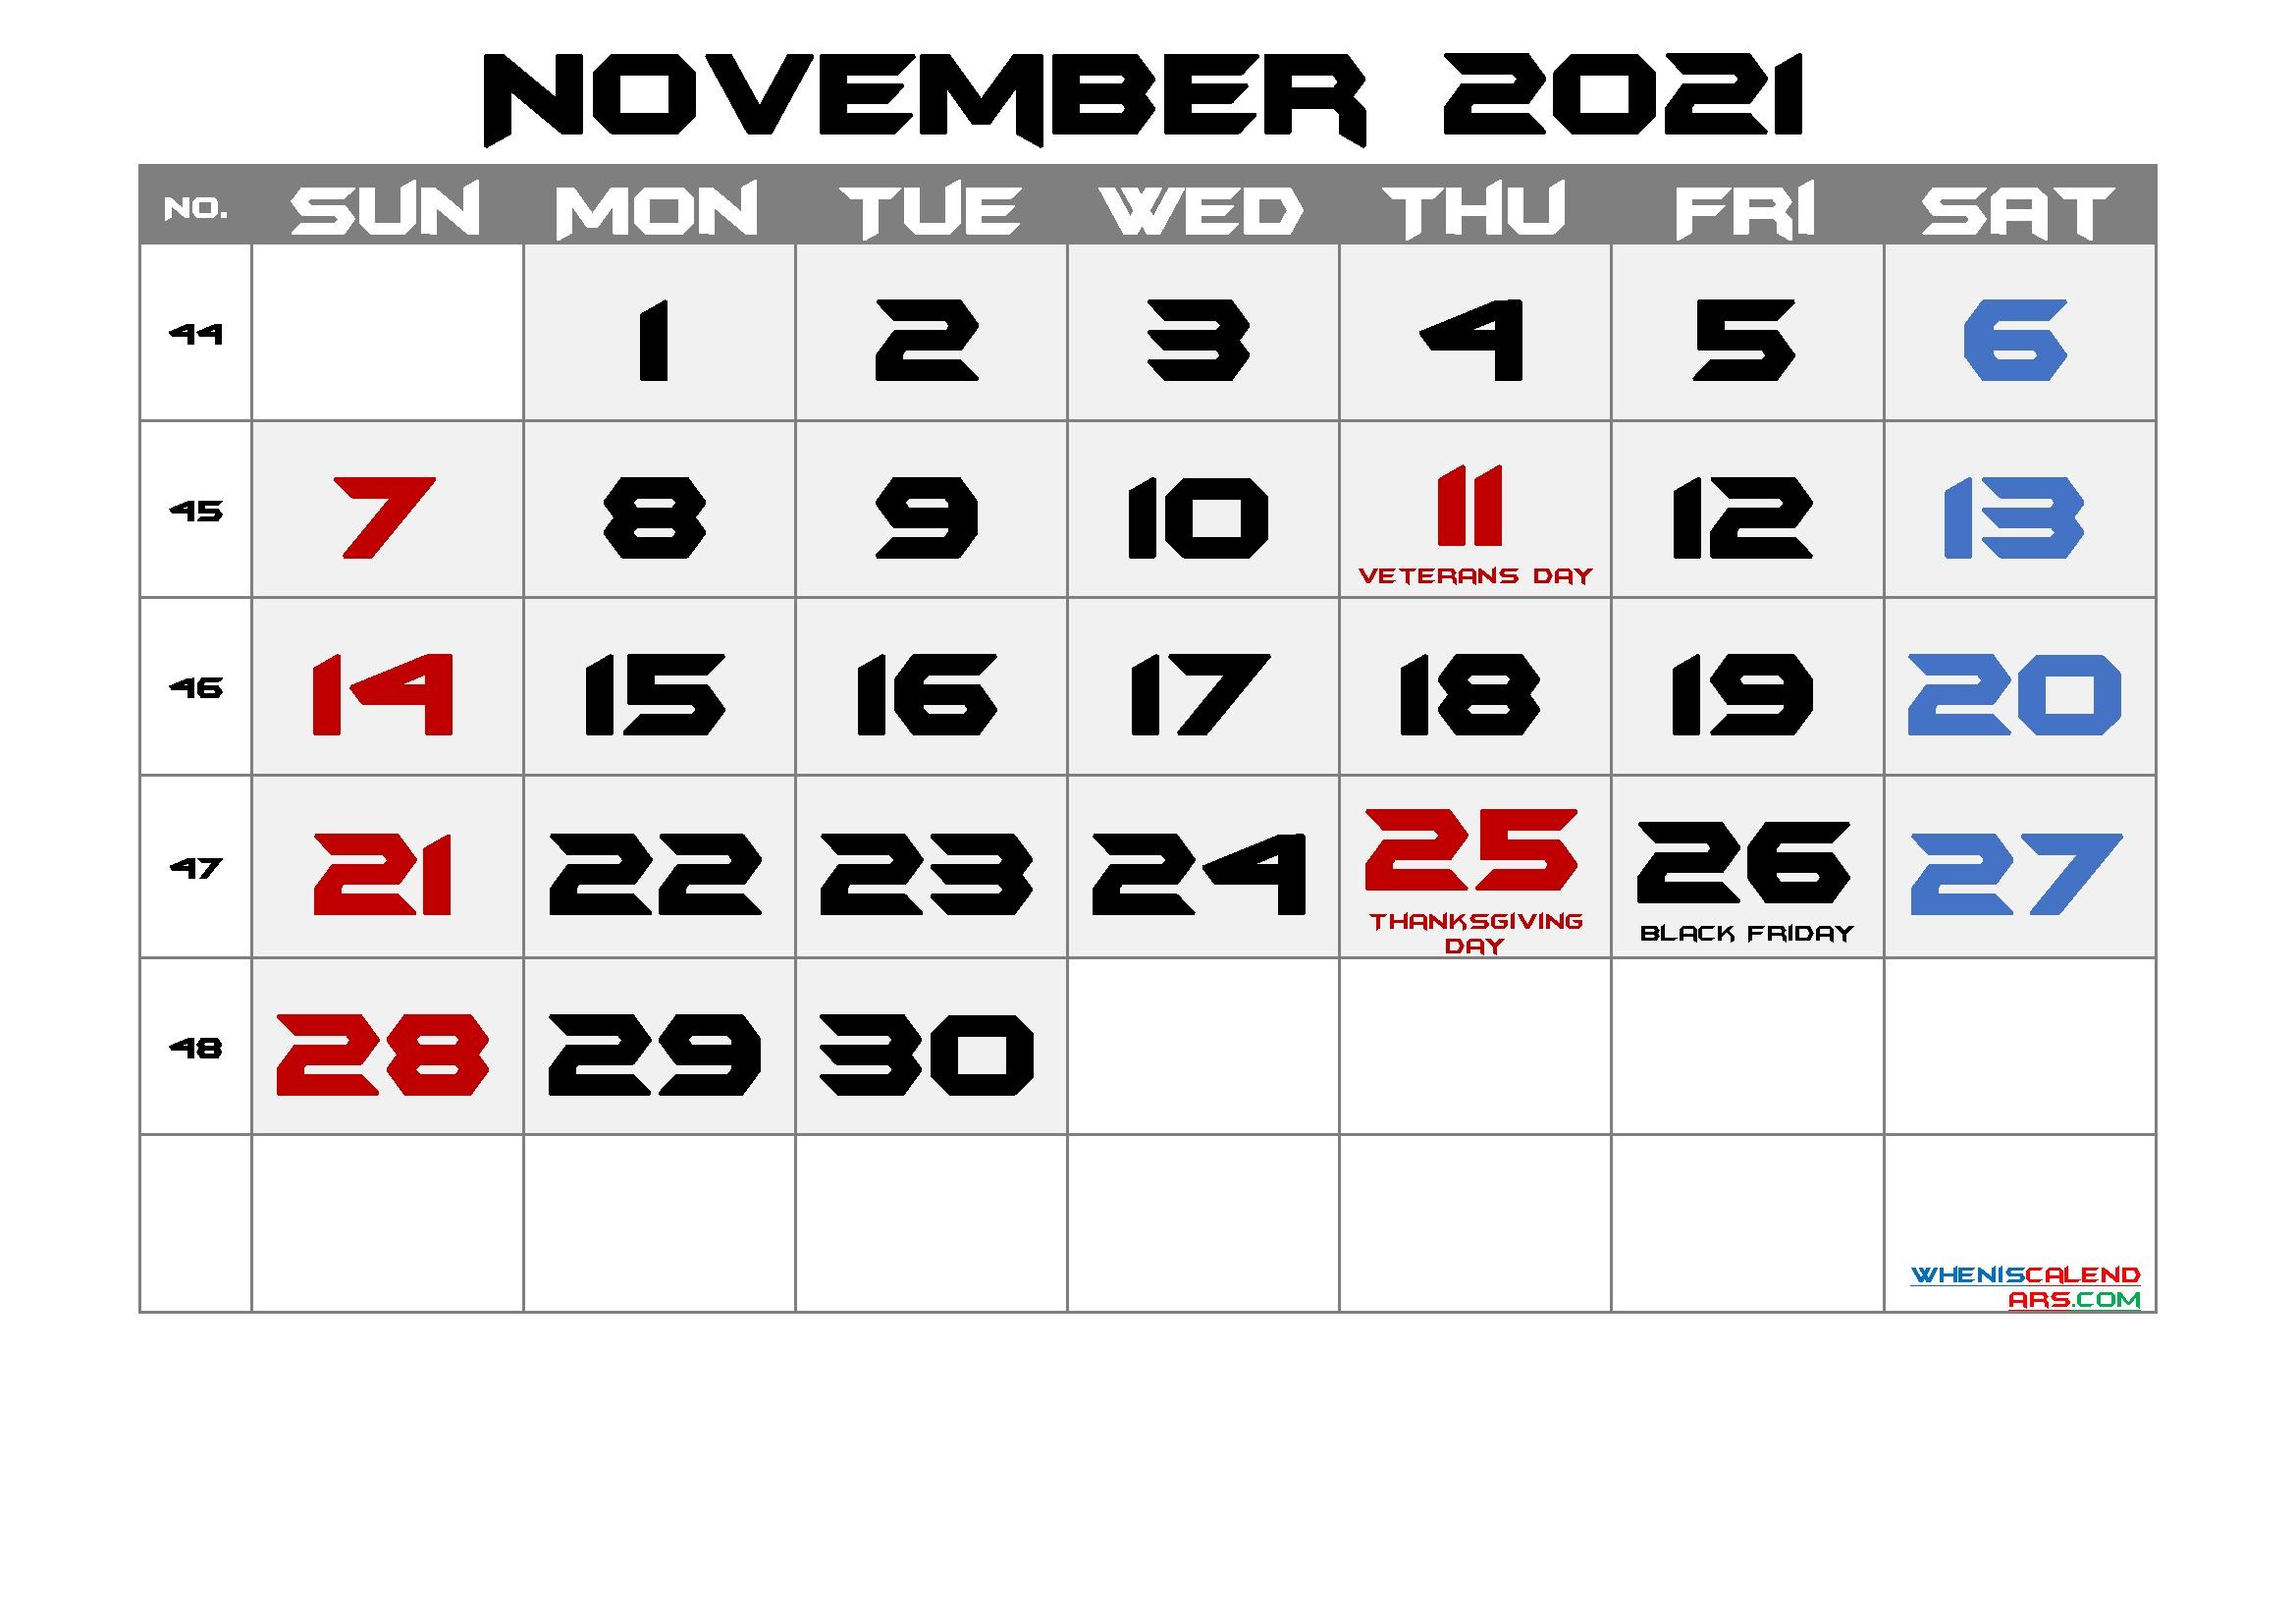 Printable November 2021 Calendar With Holidays | Free Printable 2020 Calendar With Holidays Free Printable November 2021 Calendar With Holidays